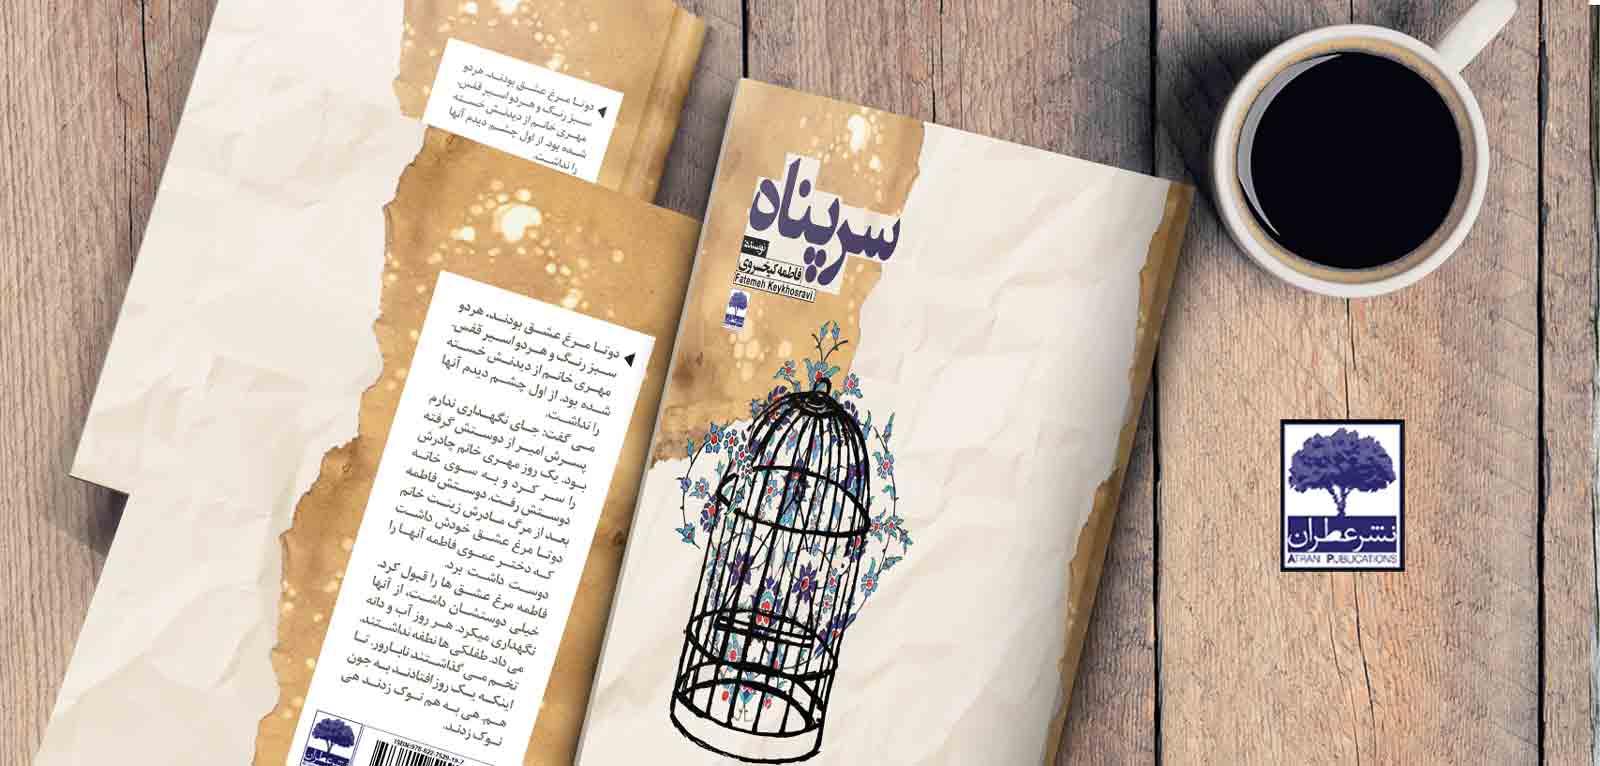 نیلوفر شامی: نویسنده کتاب